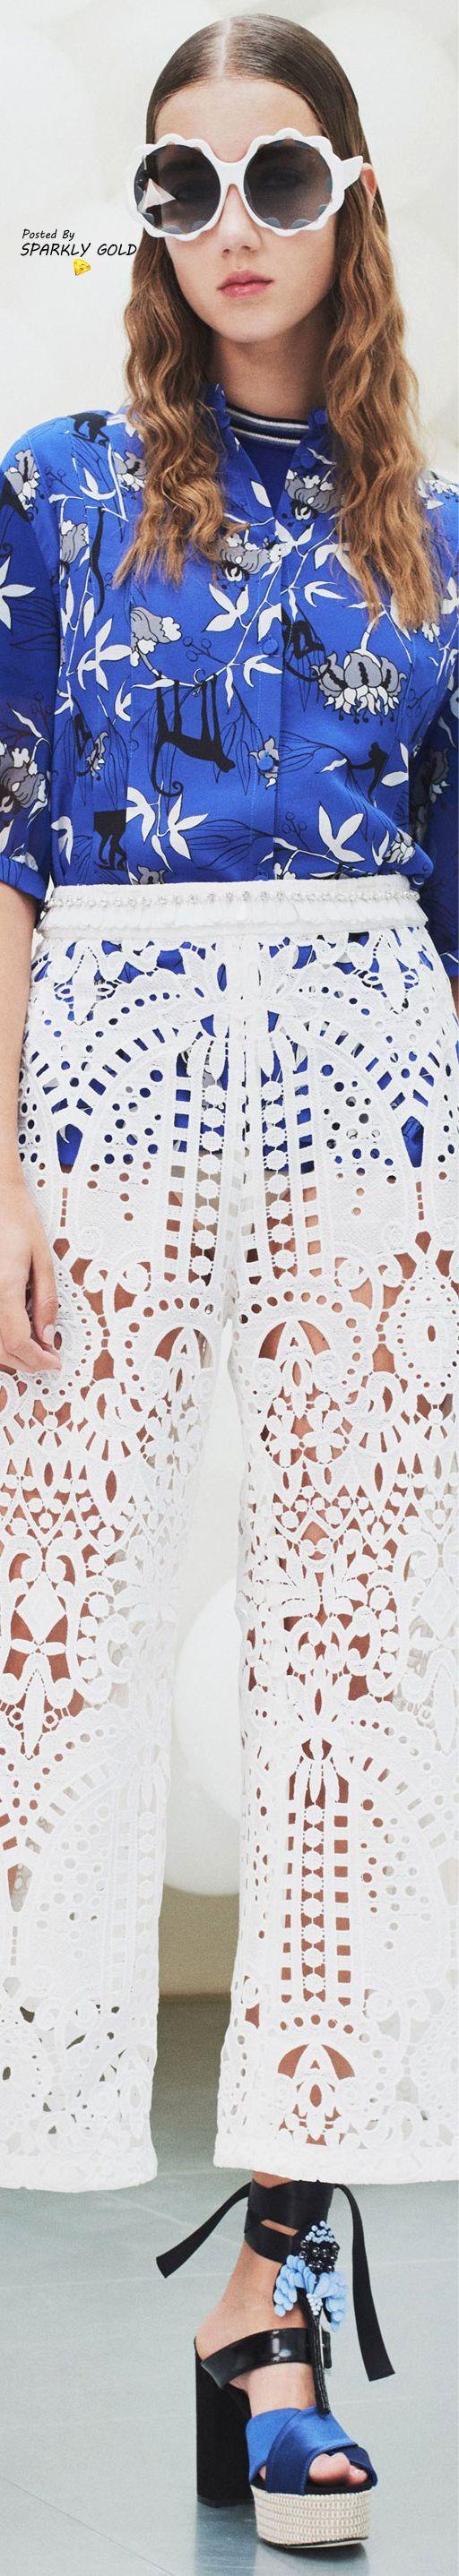 Royal blue lace wedding dress october 2018 Markus Lupfer Spring  RTW  Mark Lupfer   Pinterest